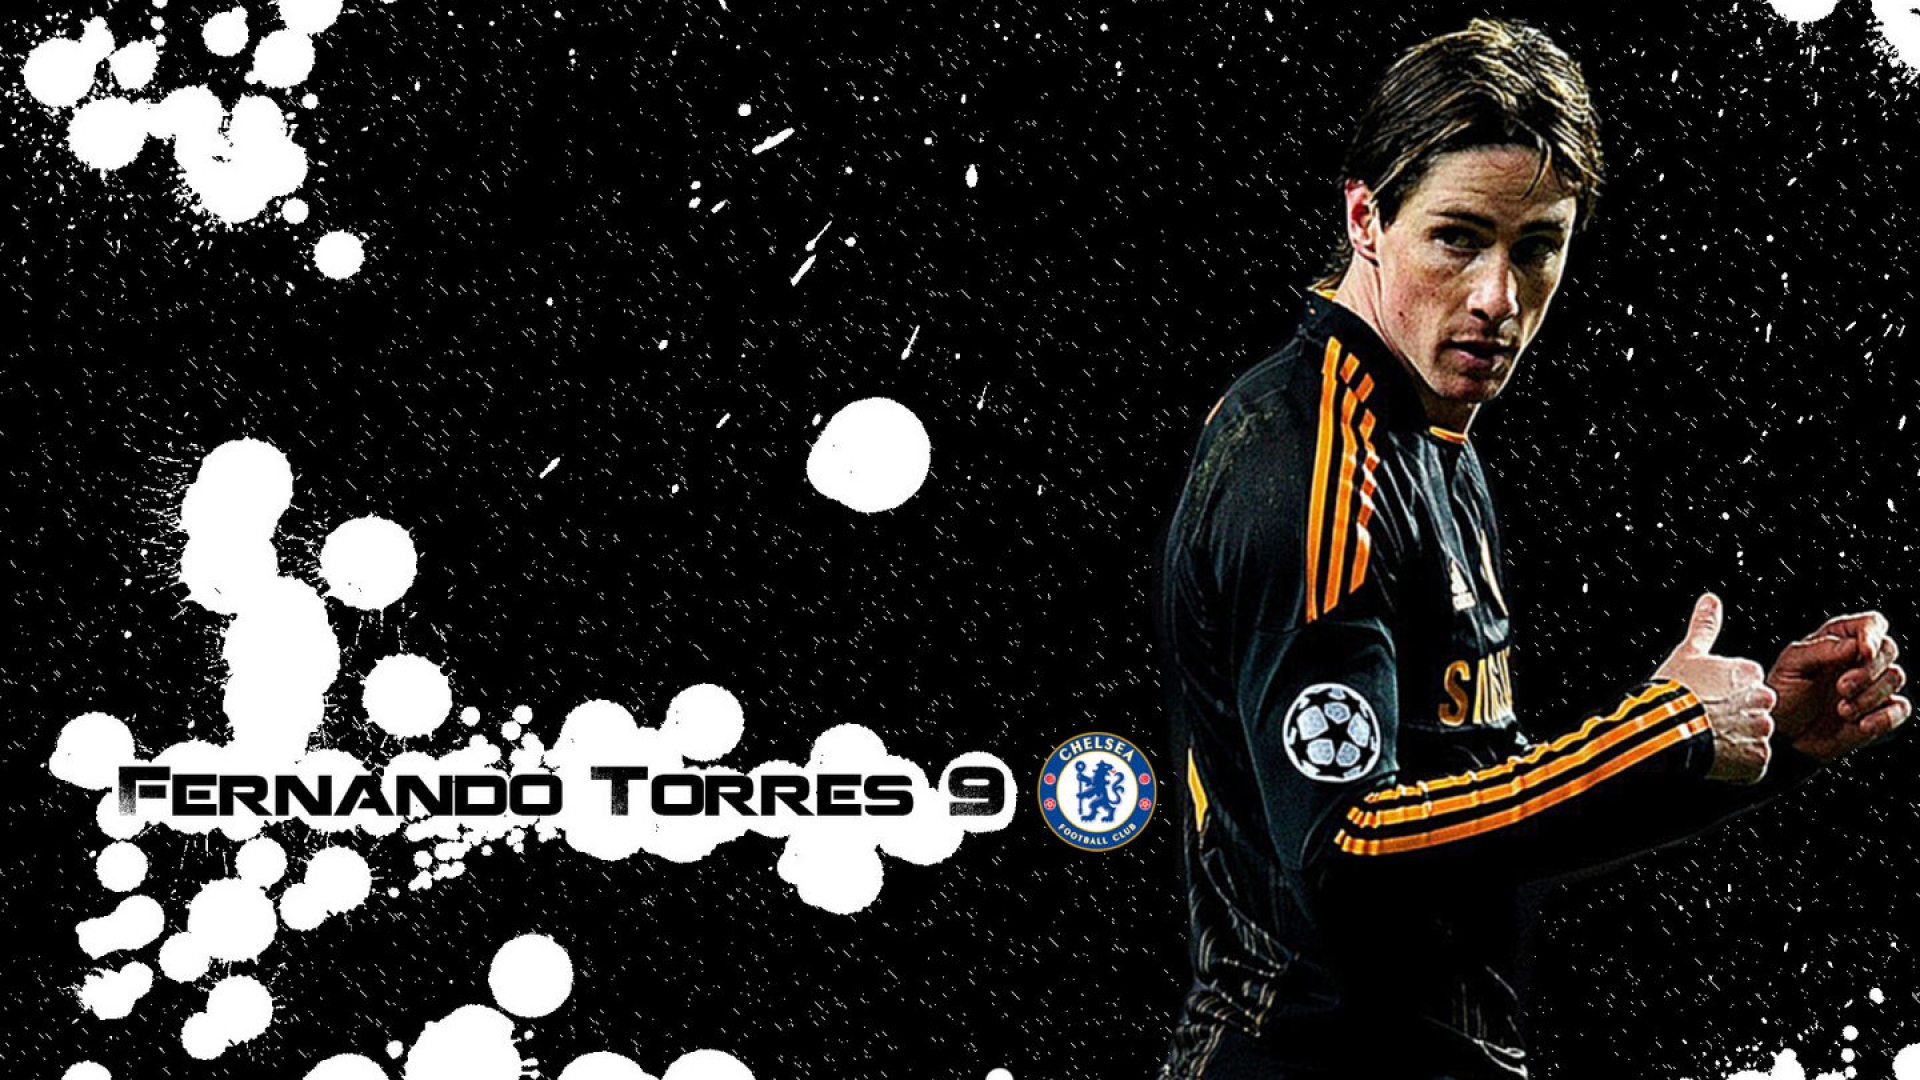 Fernando Torres Wallpaper wallpaper   964536 1920x1080